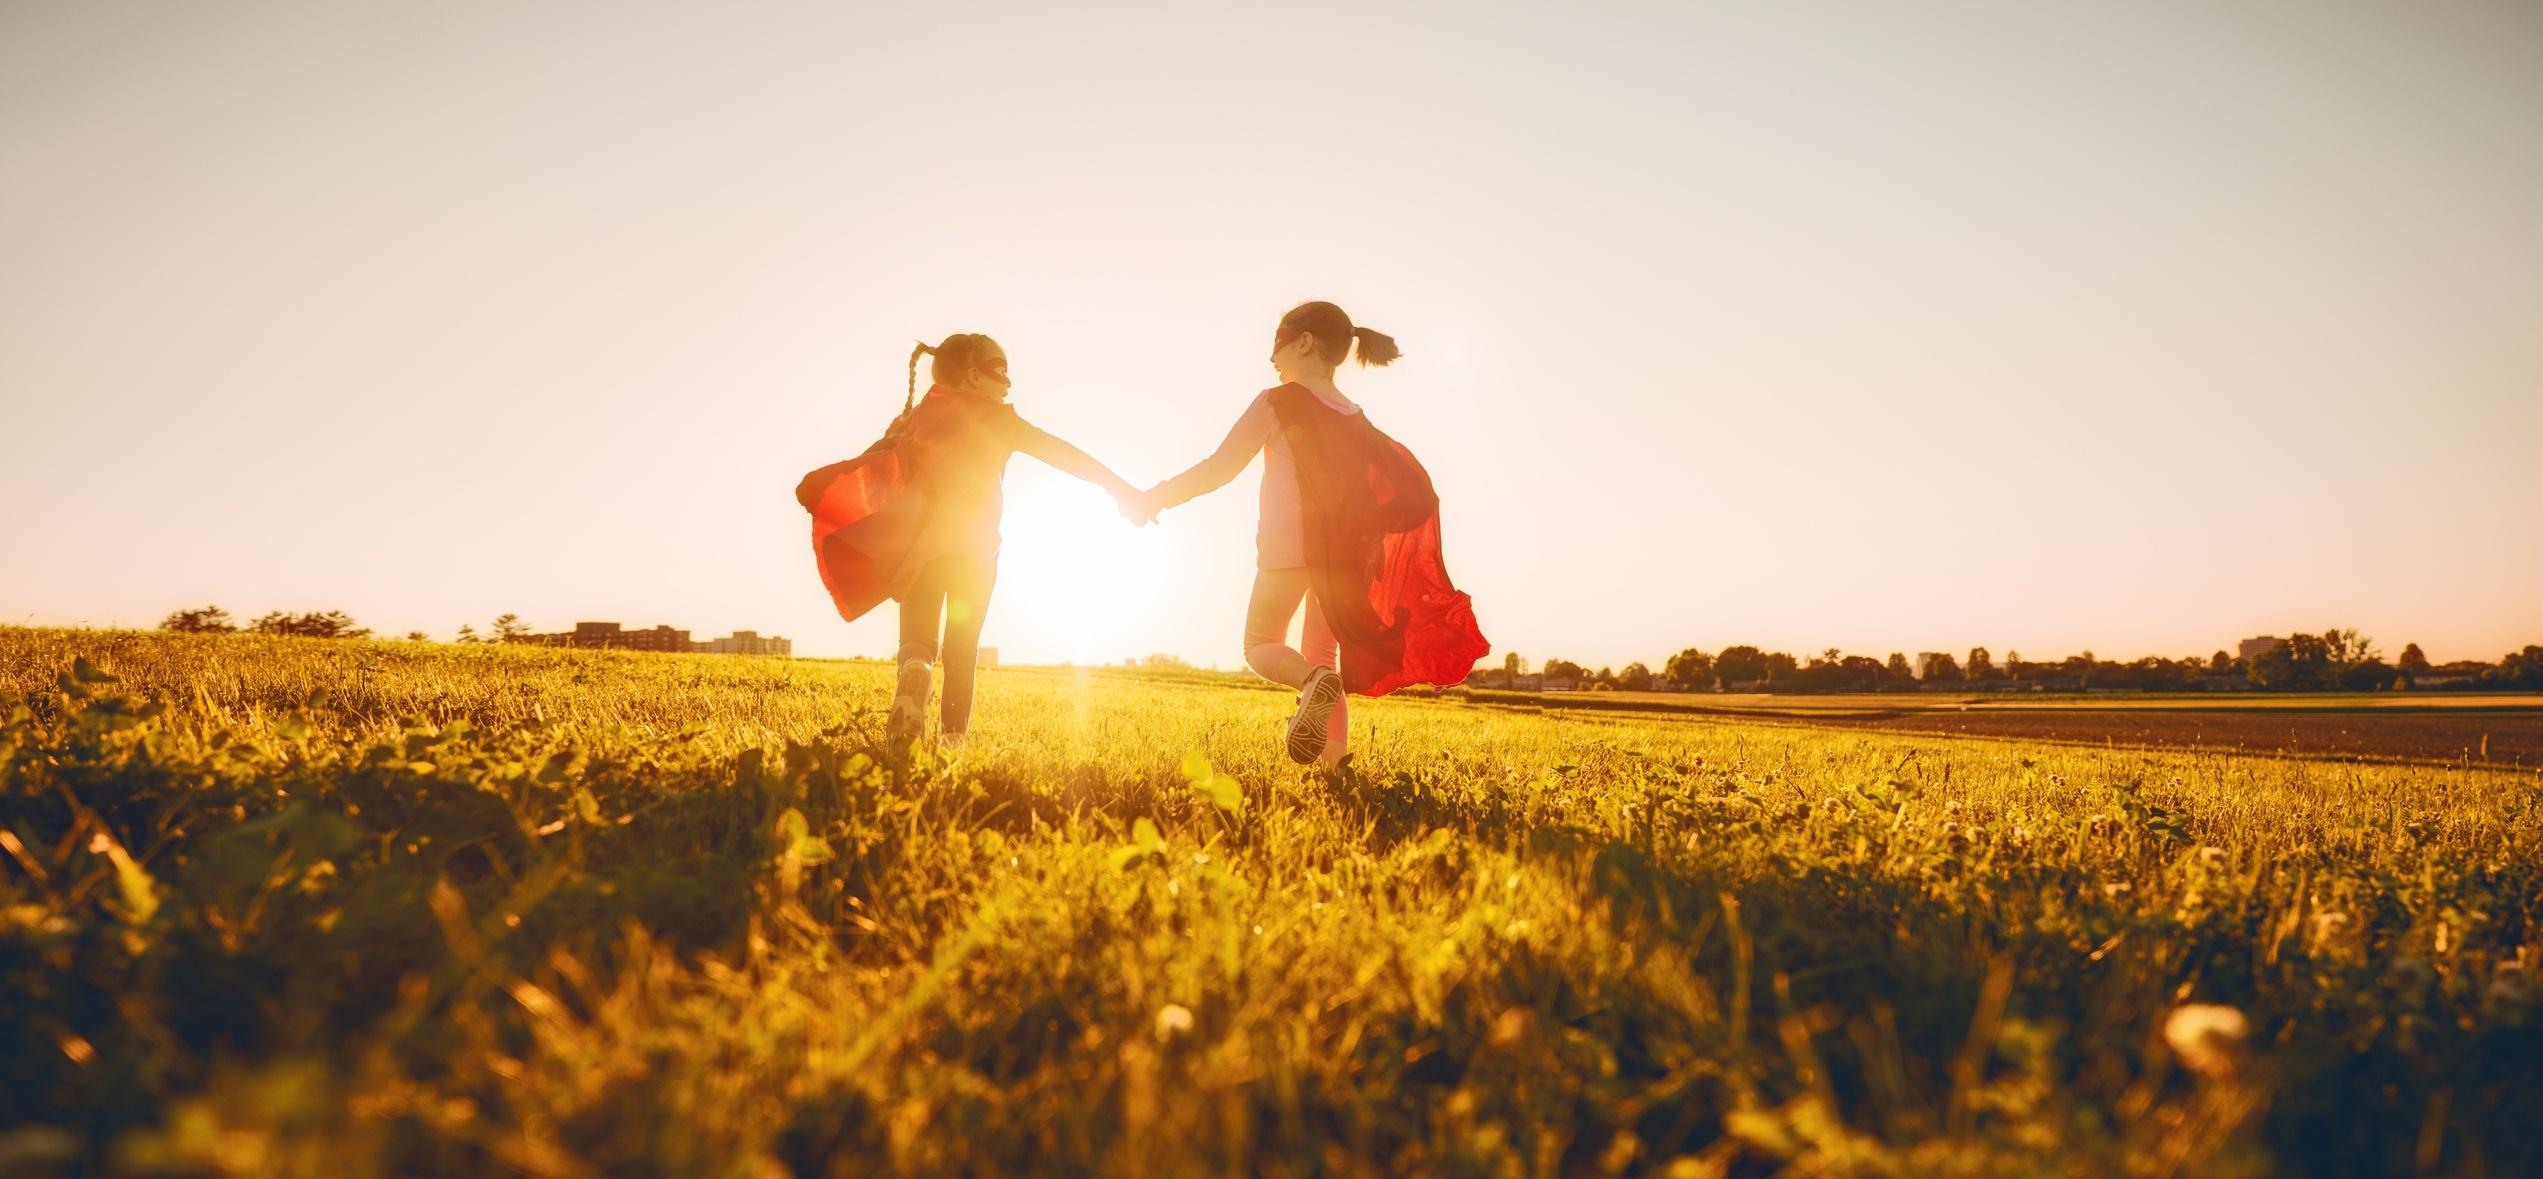 Children Dressed as Superheroes Running Through a Field